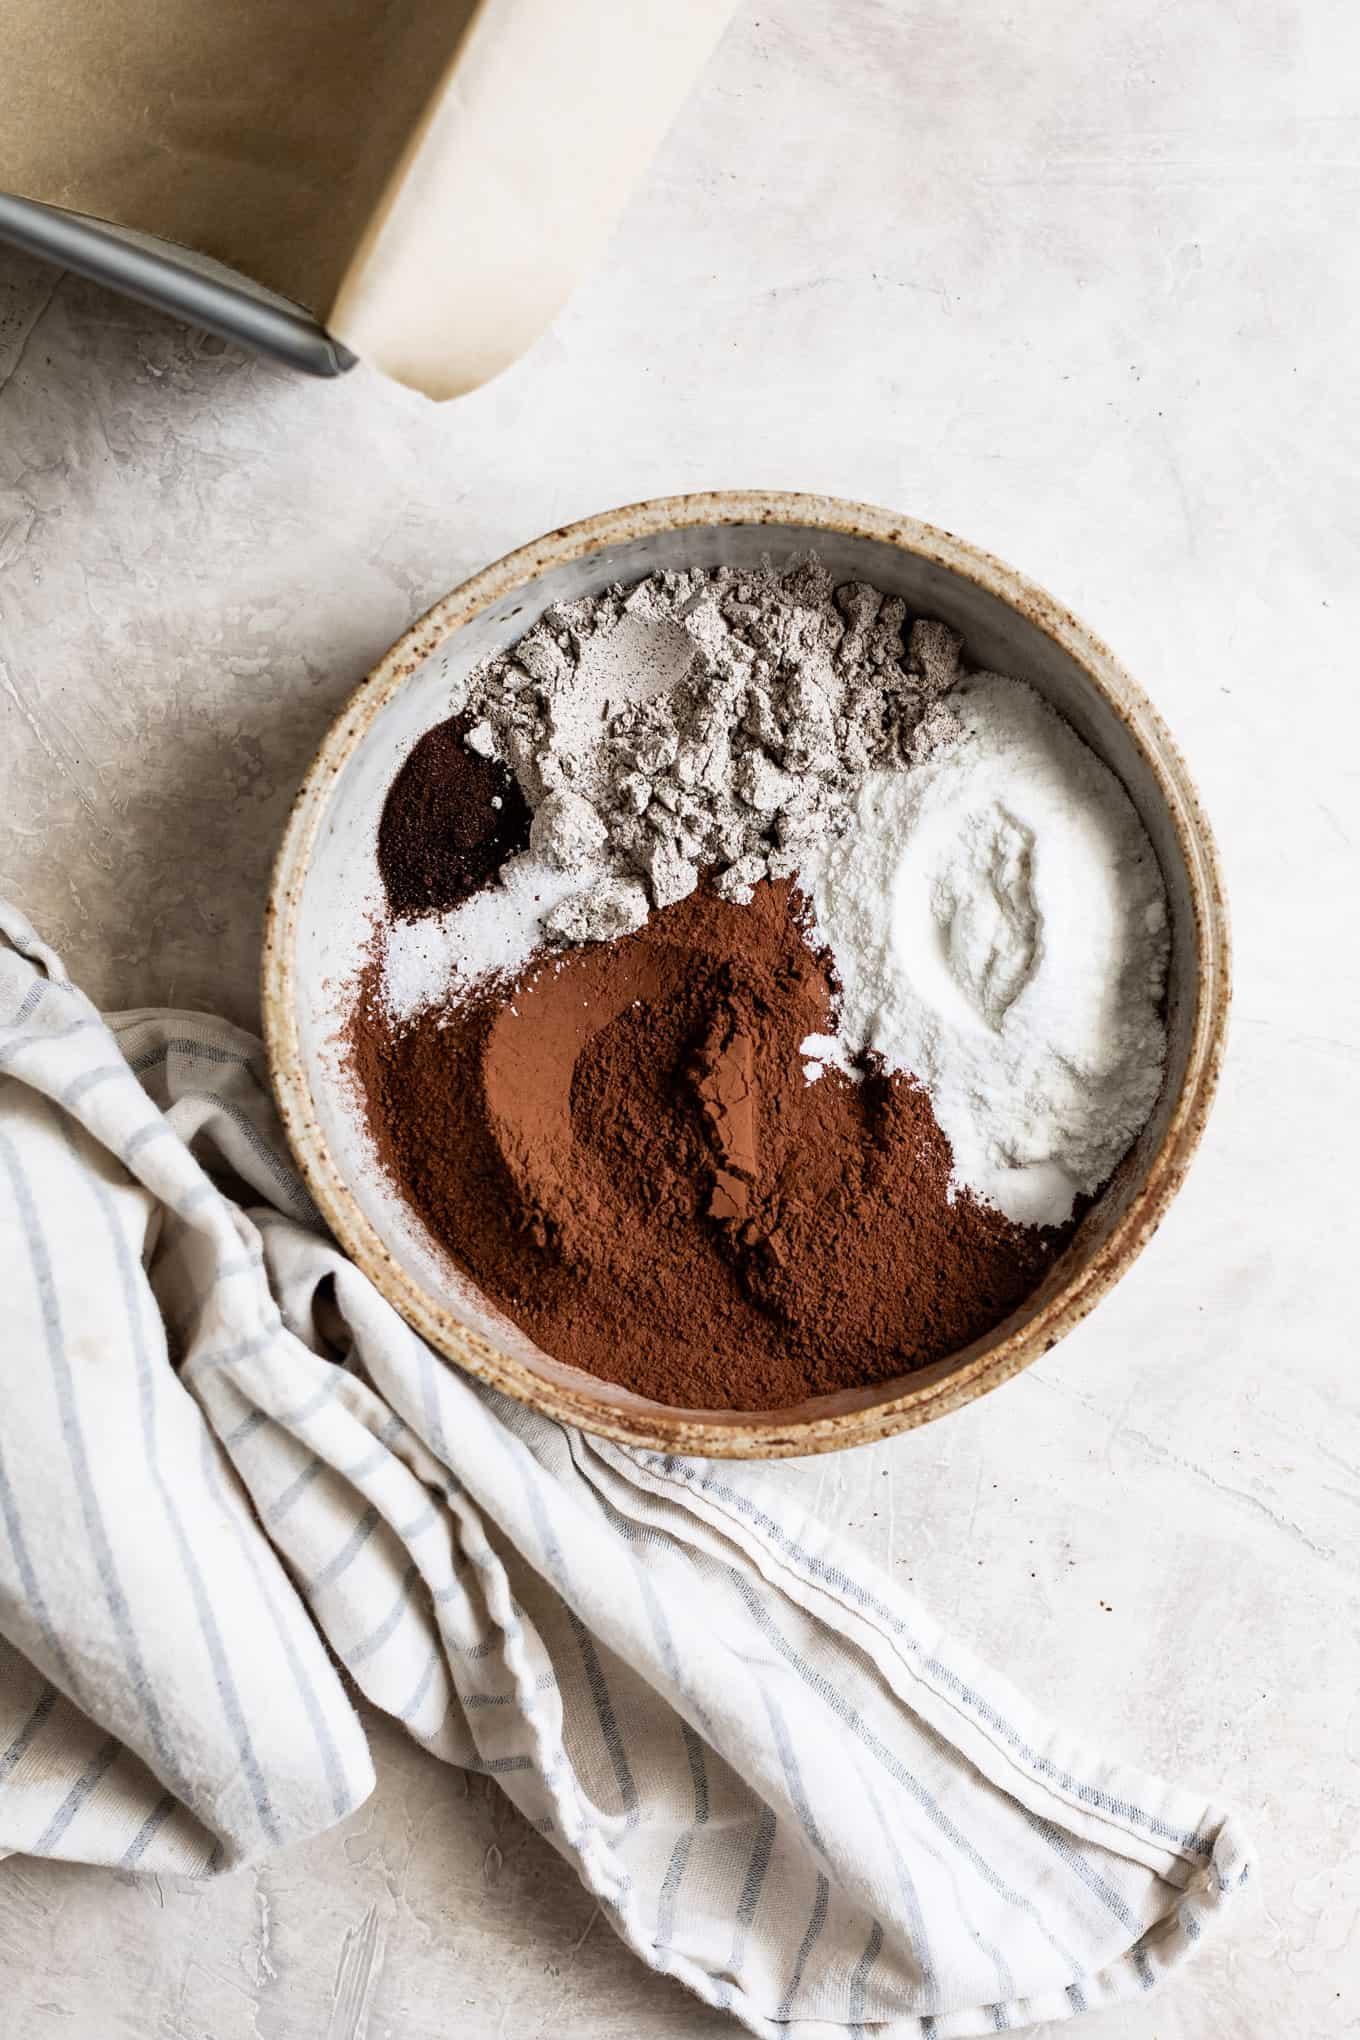 Flour Mix for Buckwheat Flour Brownies